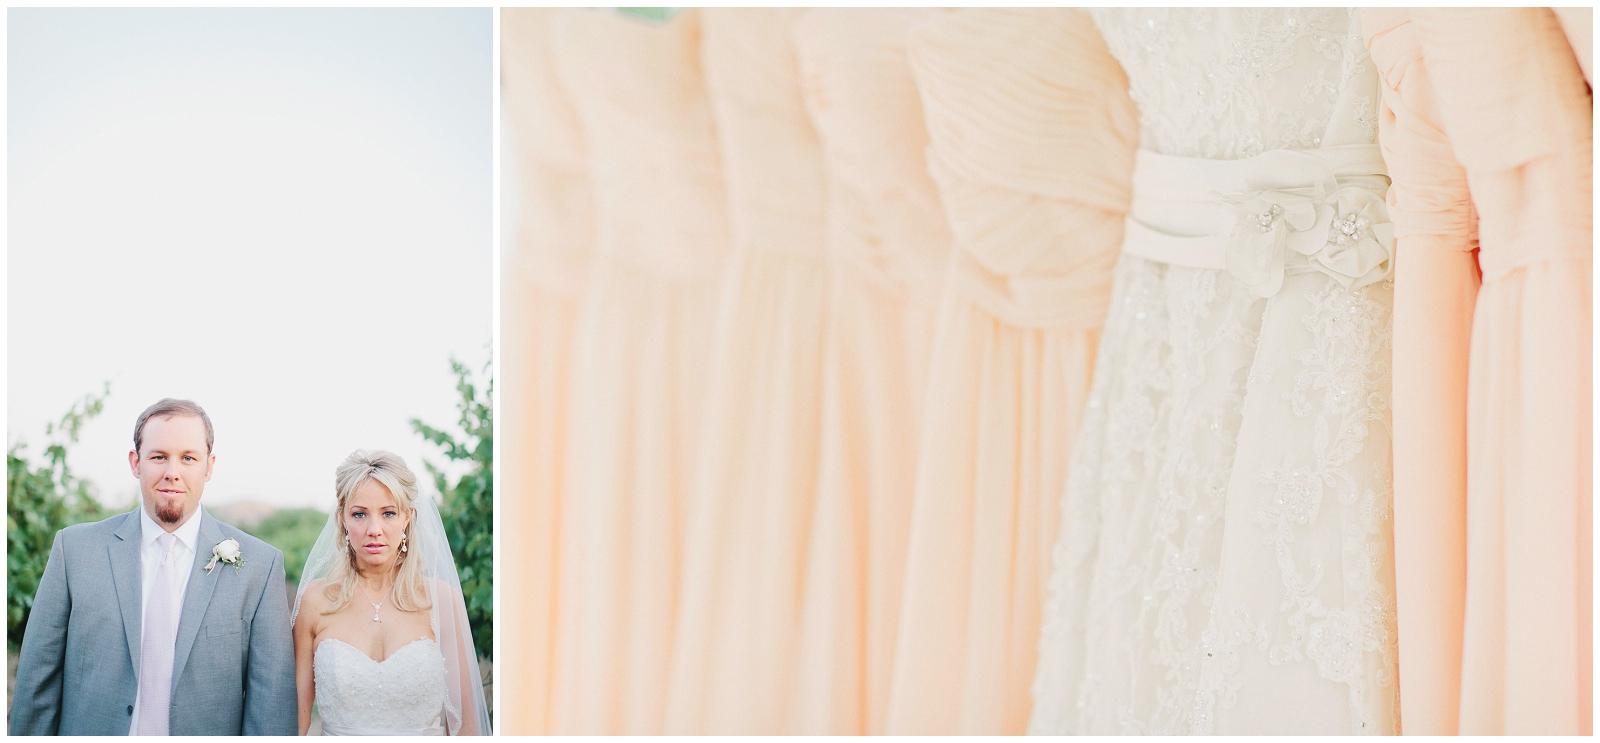 San-Francisco-Bay-Area-Wedding-Photography-Casa-Real-18.jpg